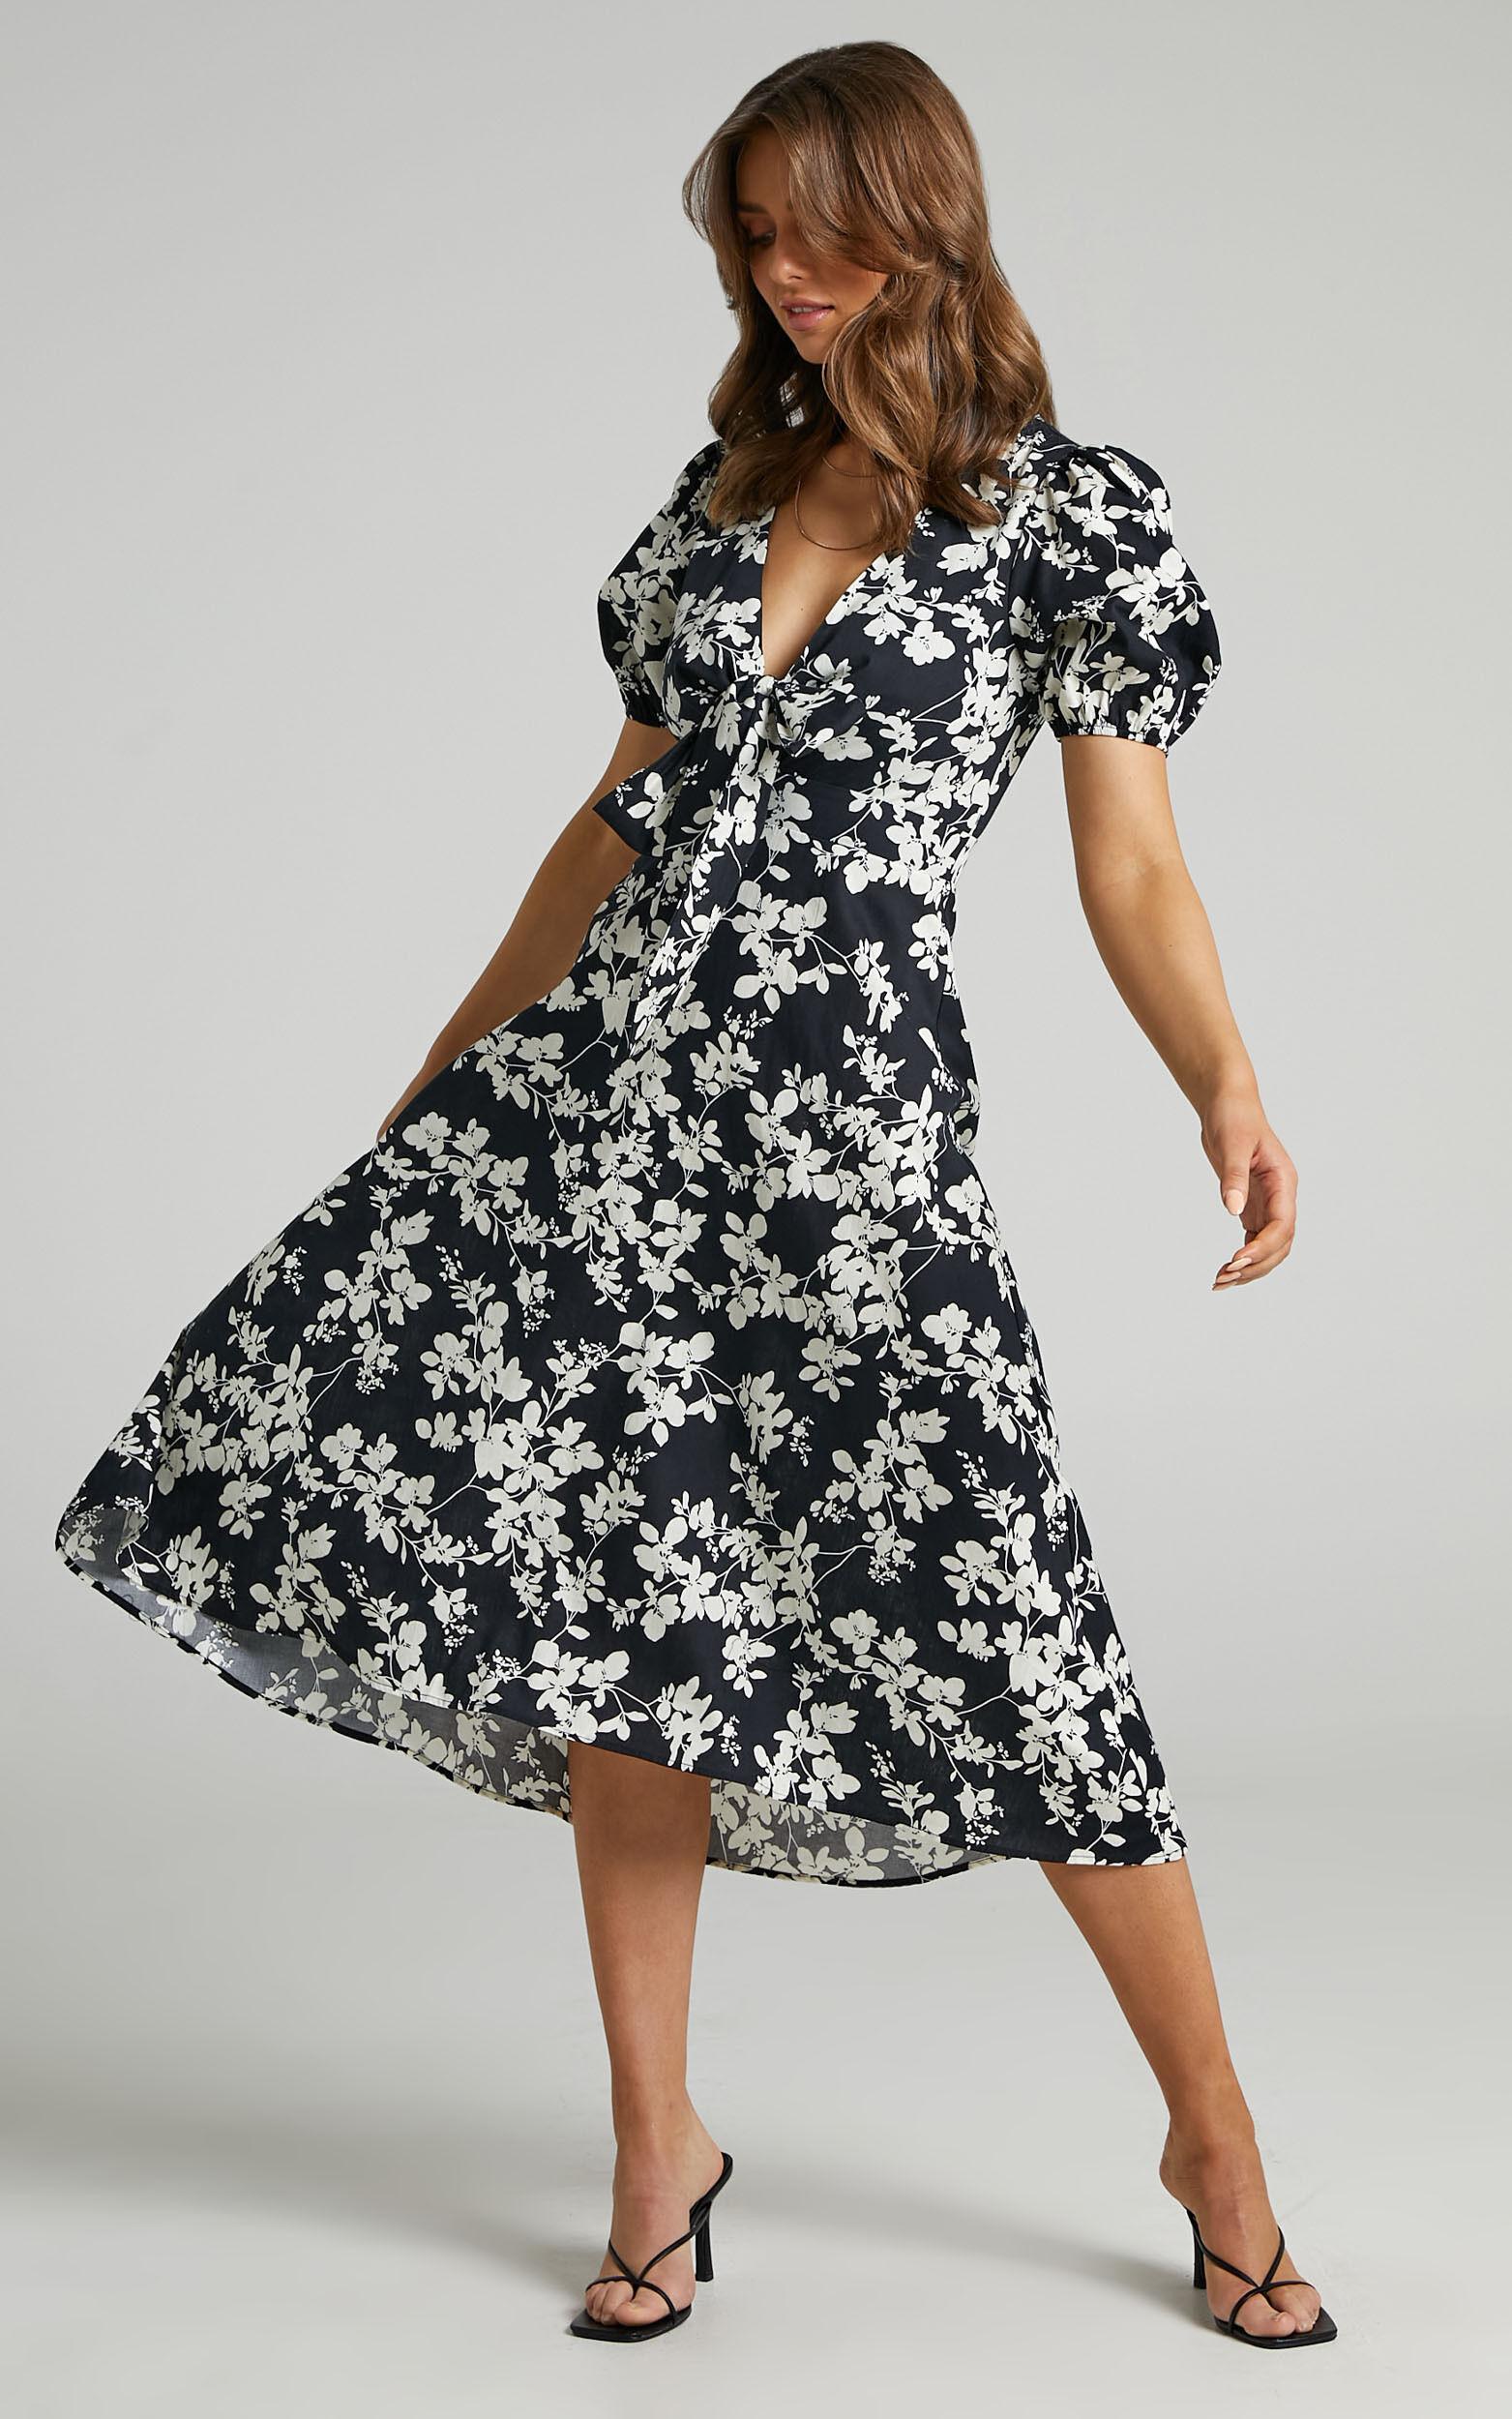 Geada Printed Short Sleeve Midi dress in Monochromatic Print - 04, BLK1, super-hi-res image number null